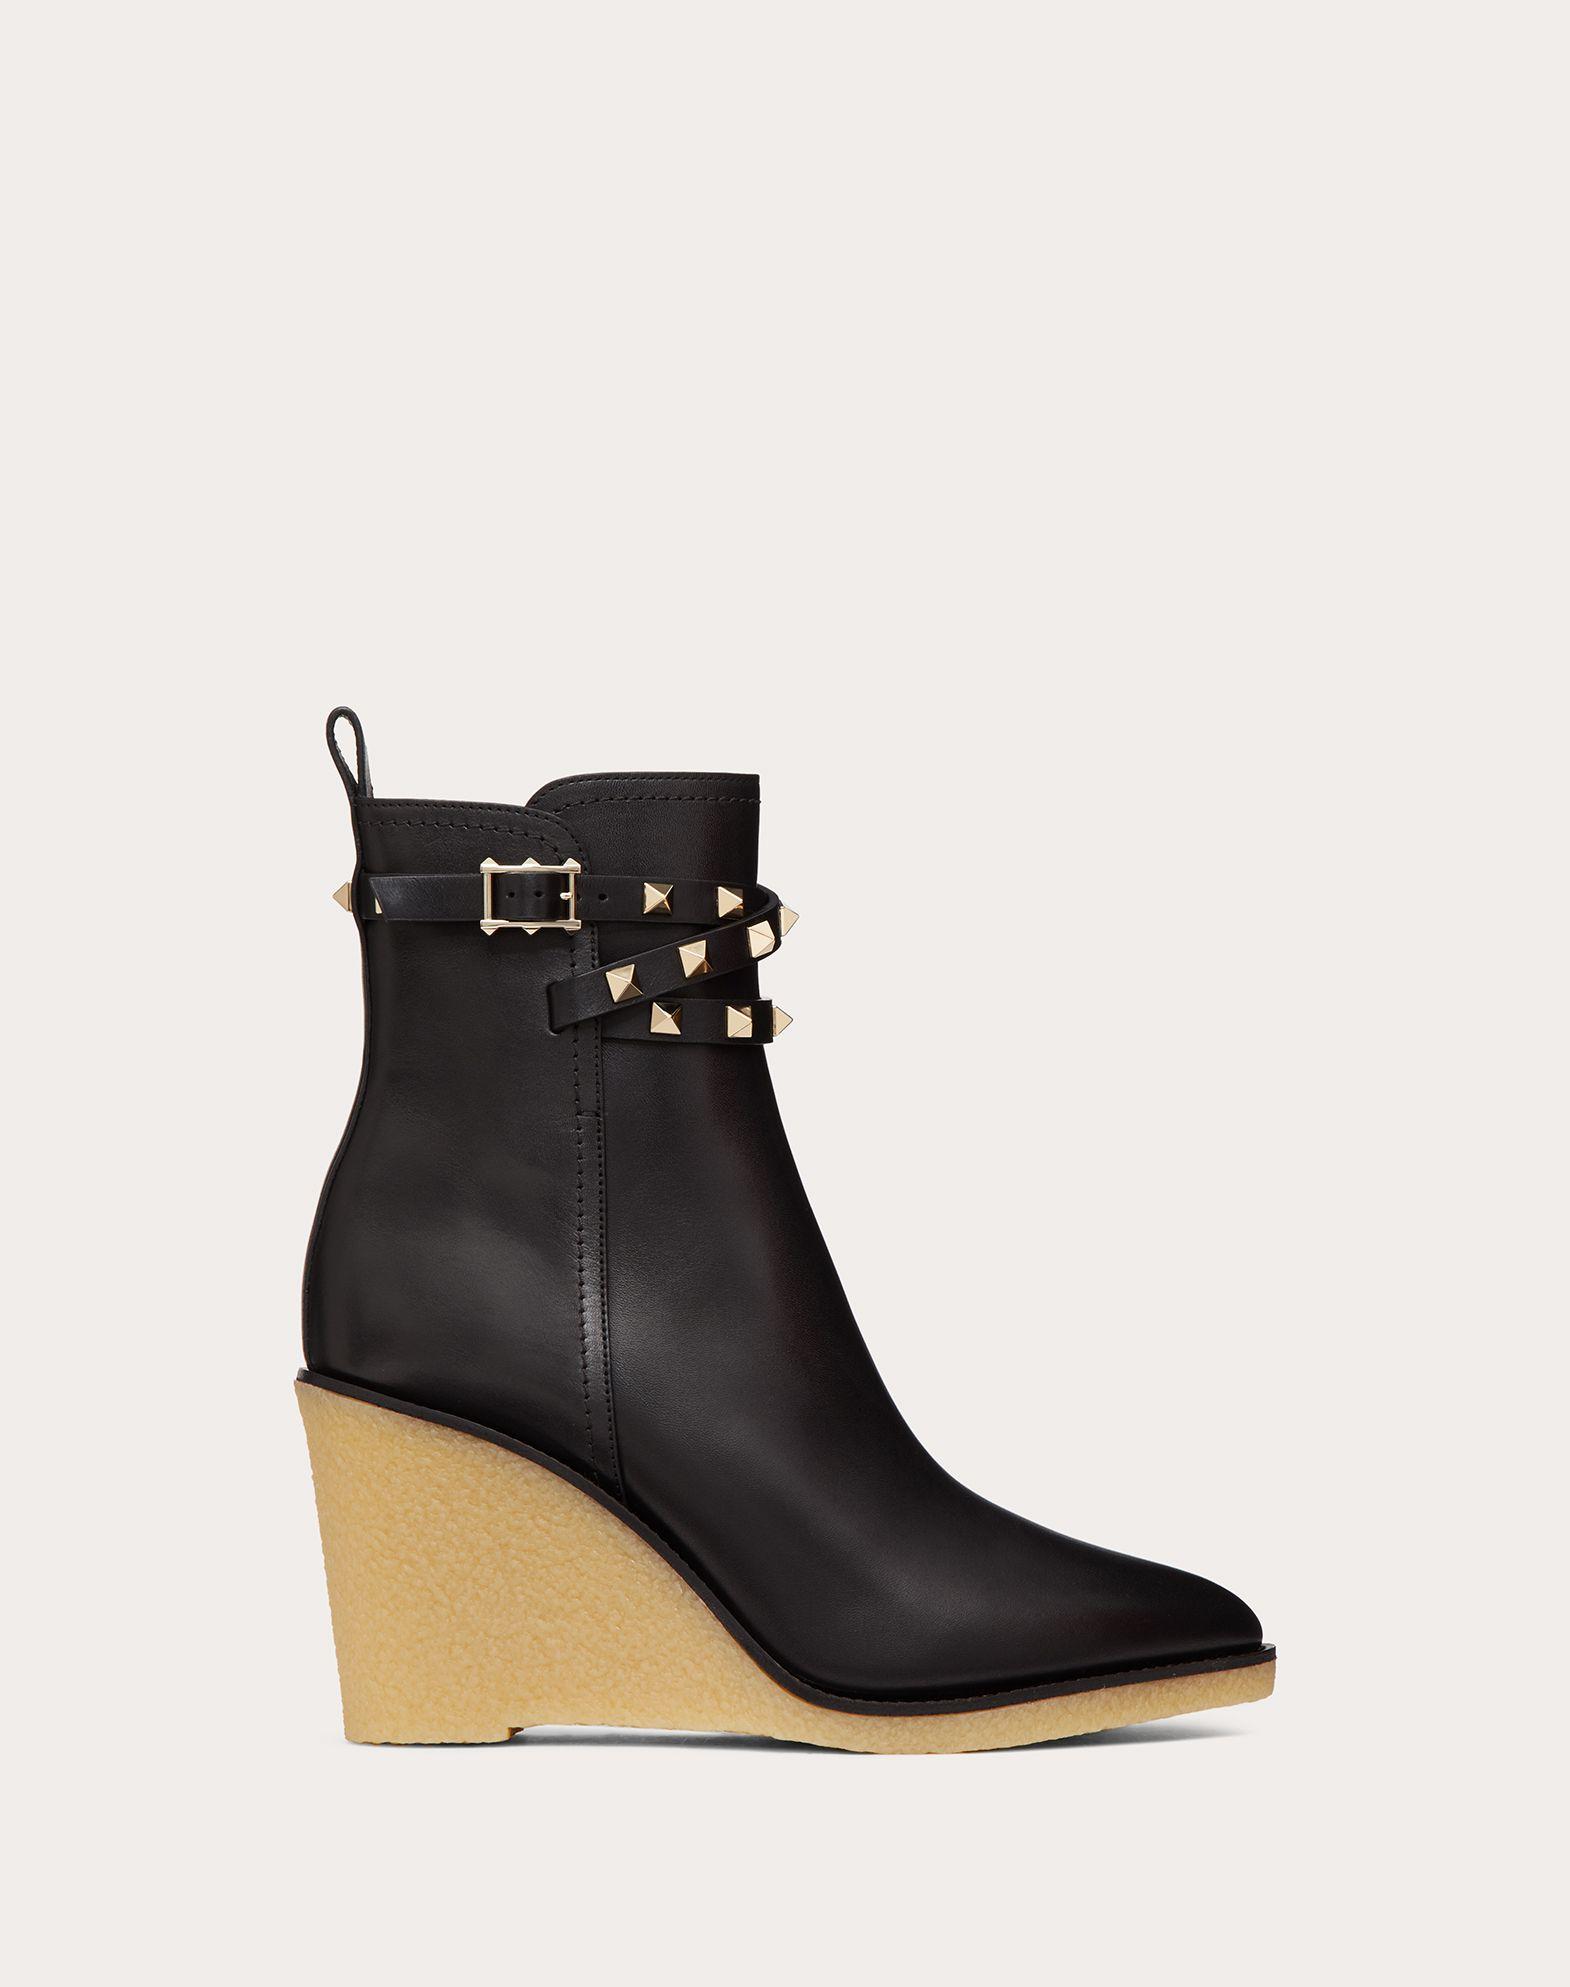 Valentino High heels VALENTINO GARAVANI ROCKSTUD CALFSKIN WEDGE ANKLE BOOT 90 MM